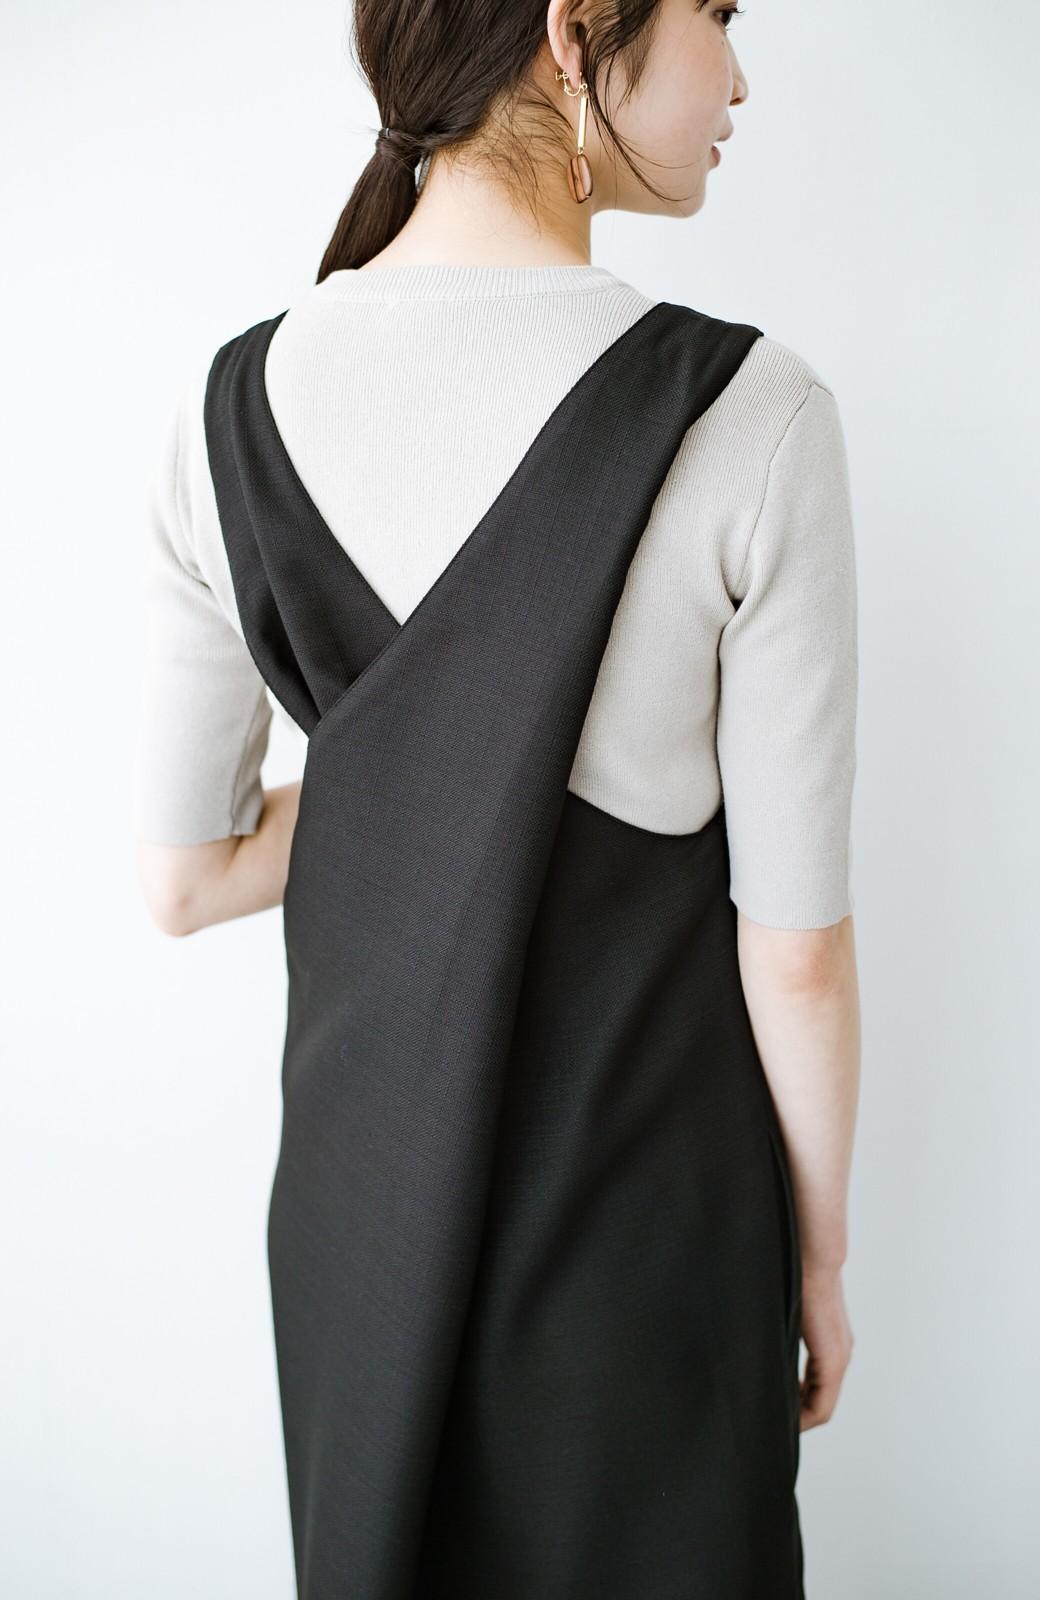 haco! 何てことないTシャツと重ねるだけでパッとかわいくなれる 魔法のようなジャンパースカート <ブラック>の商品写真6